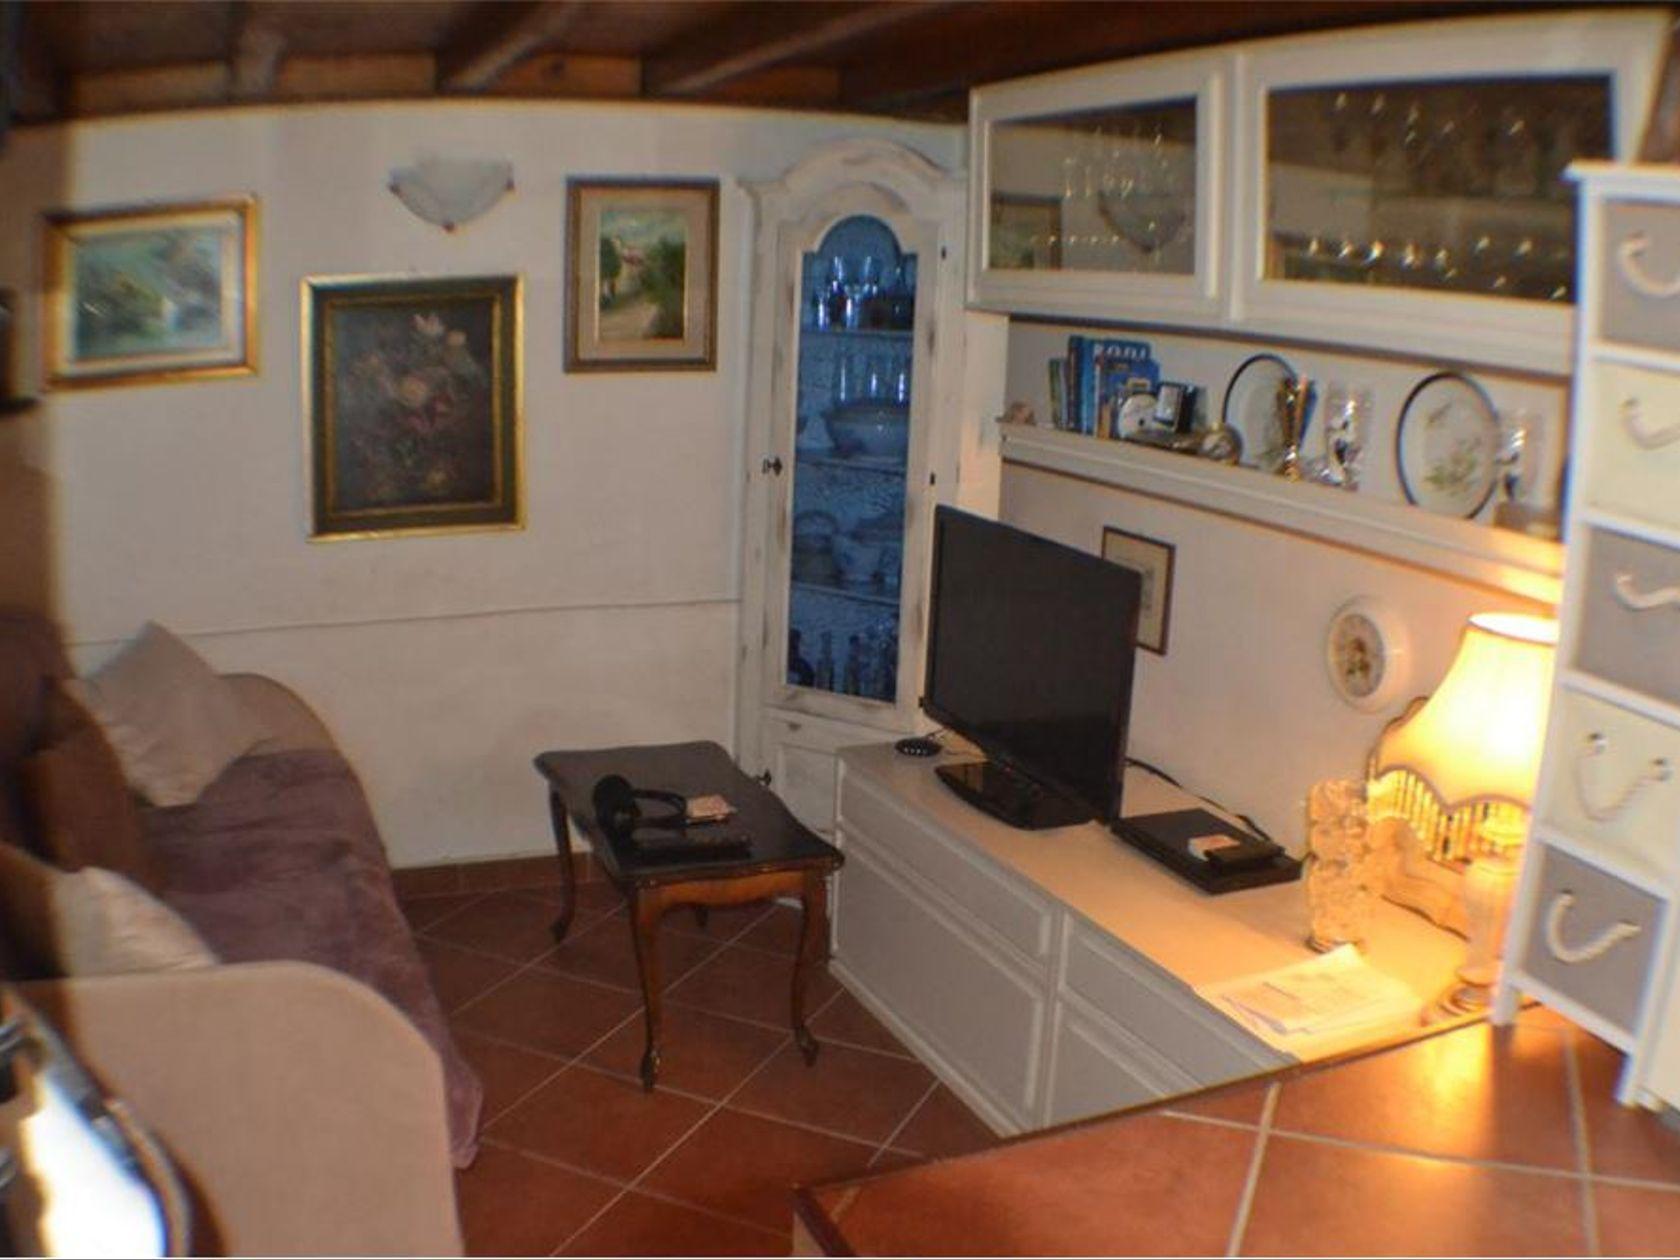 Appartamento Firenze - Firenze Sud Gavinana Europa, Firenze, FI Vendita - Foto 16